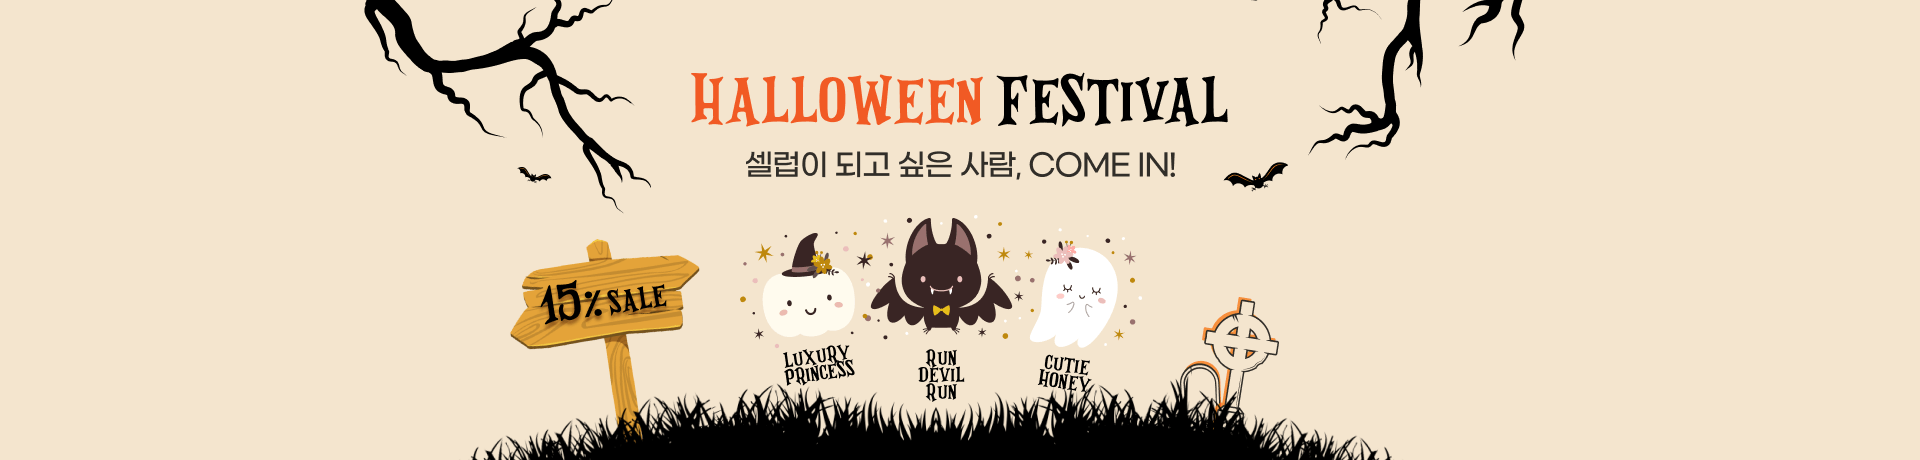 211018_yh_rentit-halloween-festival_pc-_f4e5ce